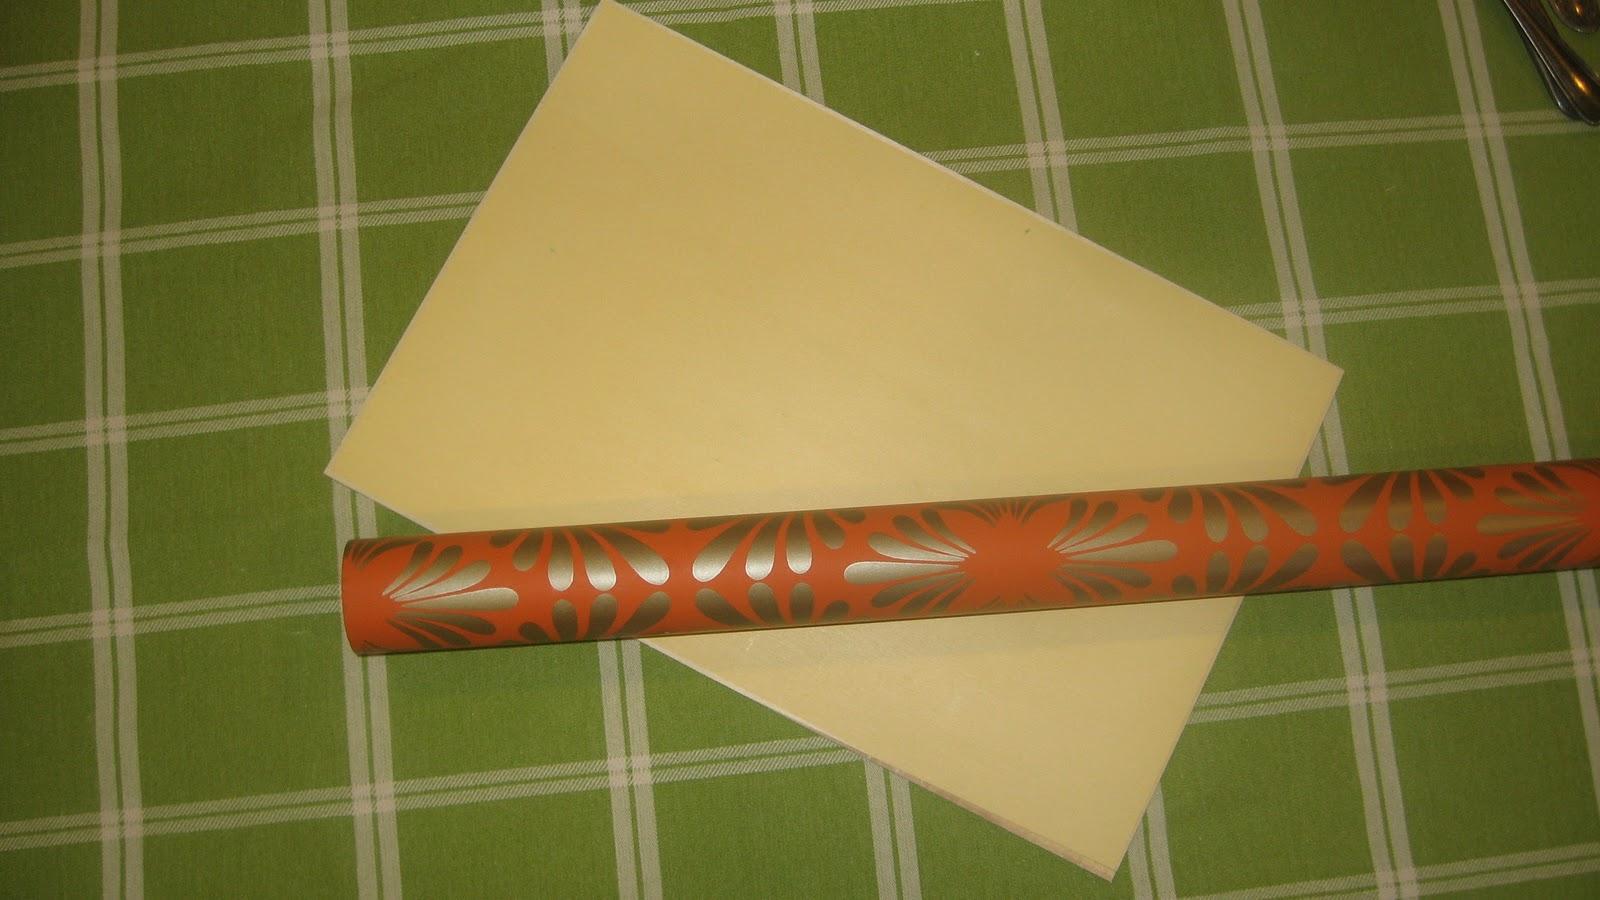 Free Download Wallpaper Adhesive Spray Download Wallpaper